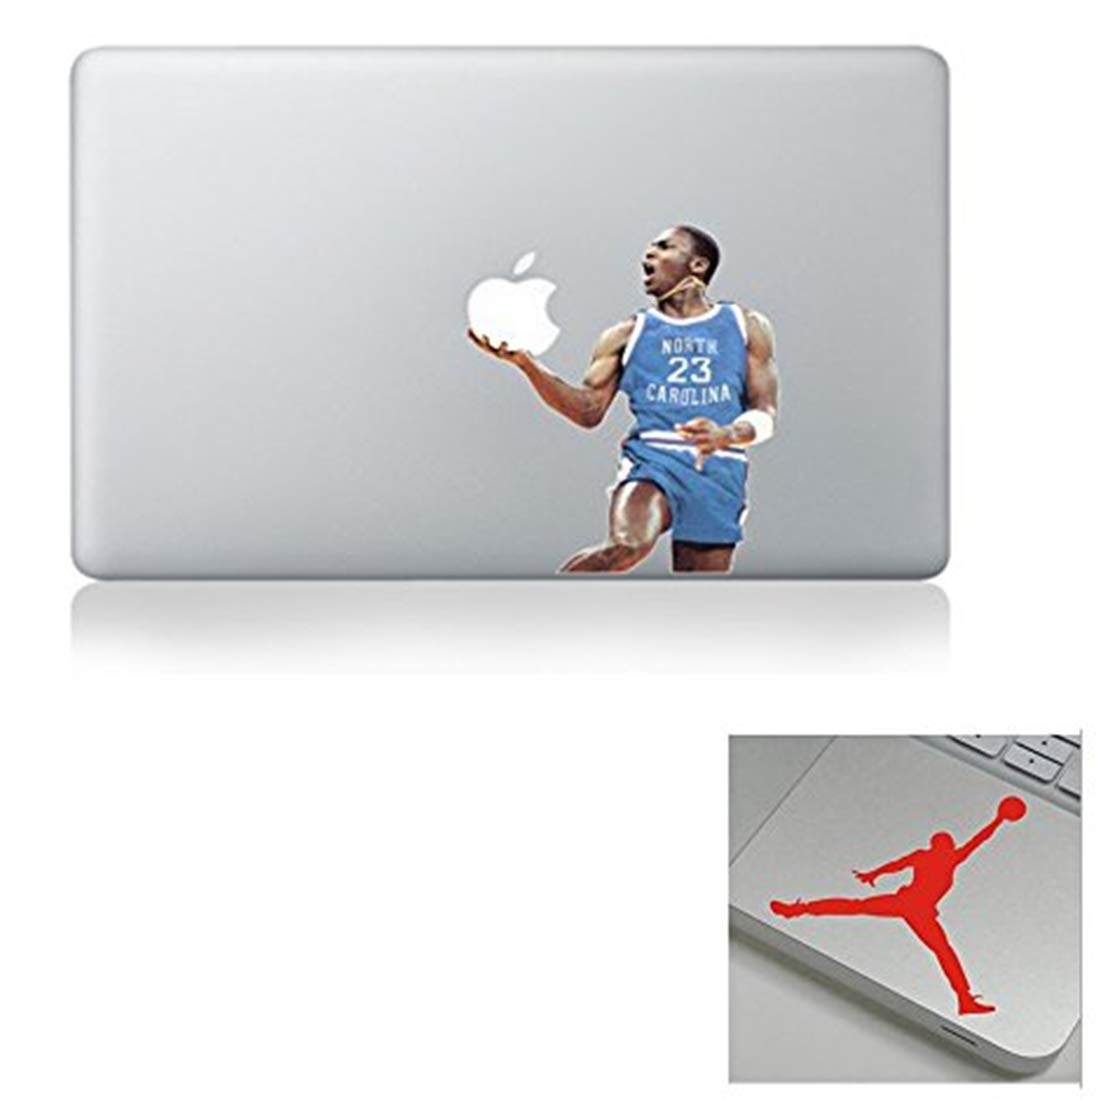 MJ Jordan Concord Unique Sticker Decals Vinyl Skin Cover for Macbook Computer Laptops 13 15 17 inch Computer